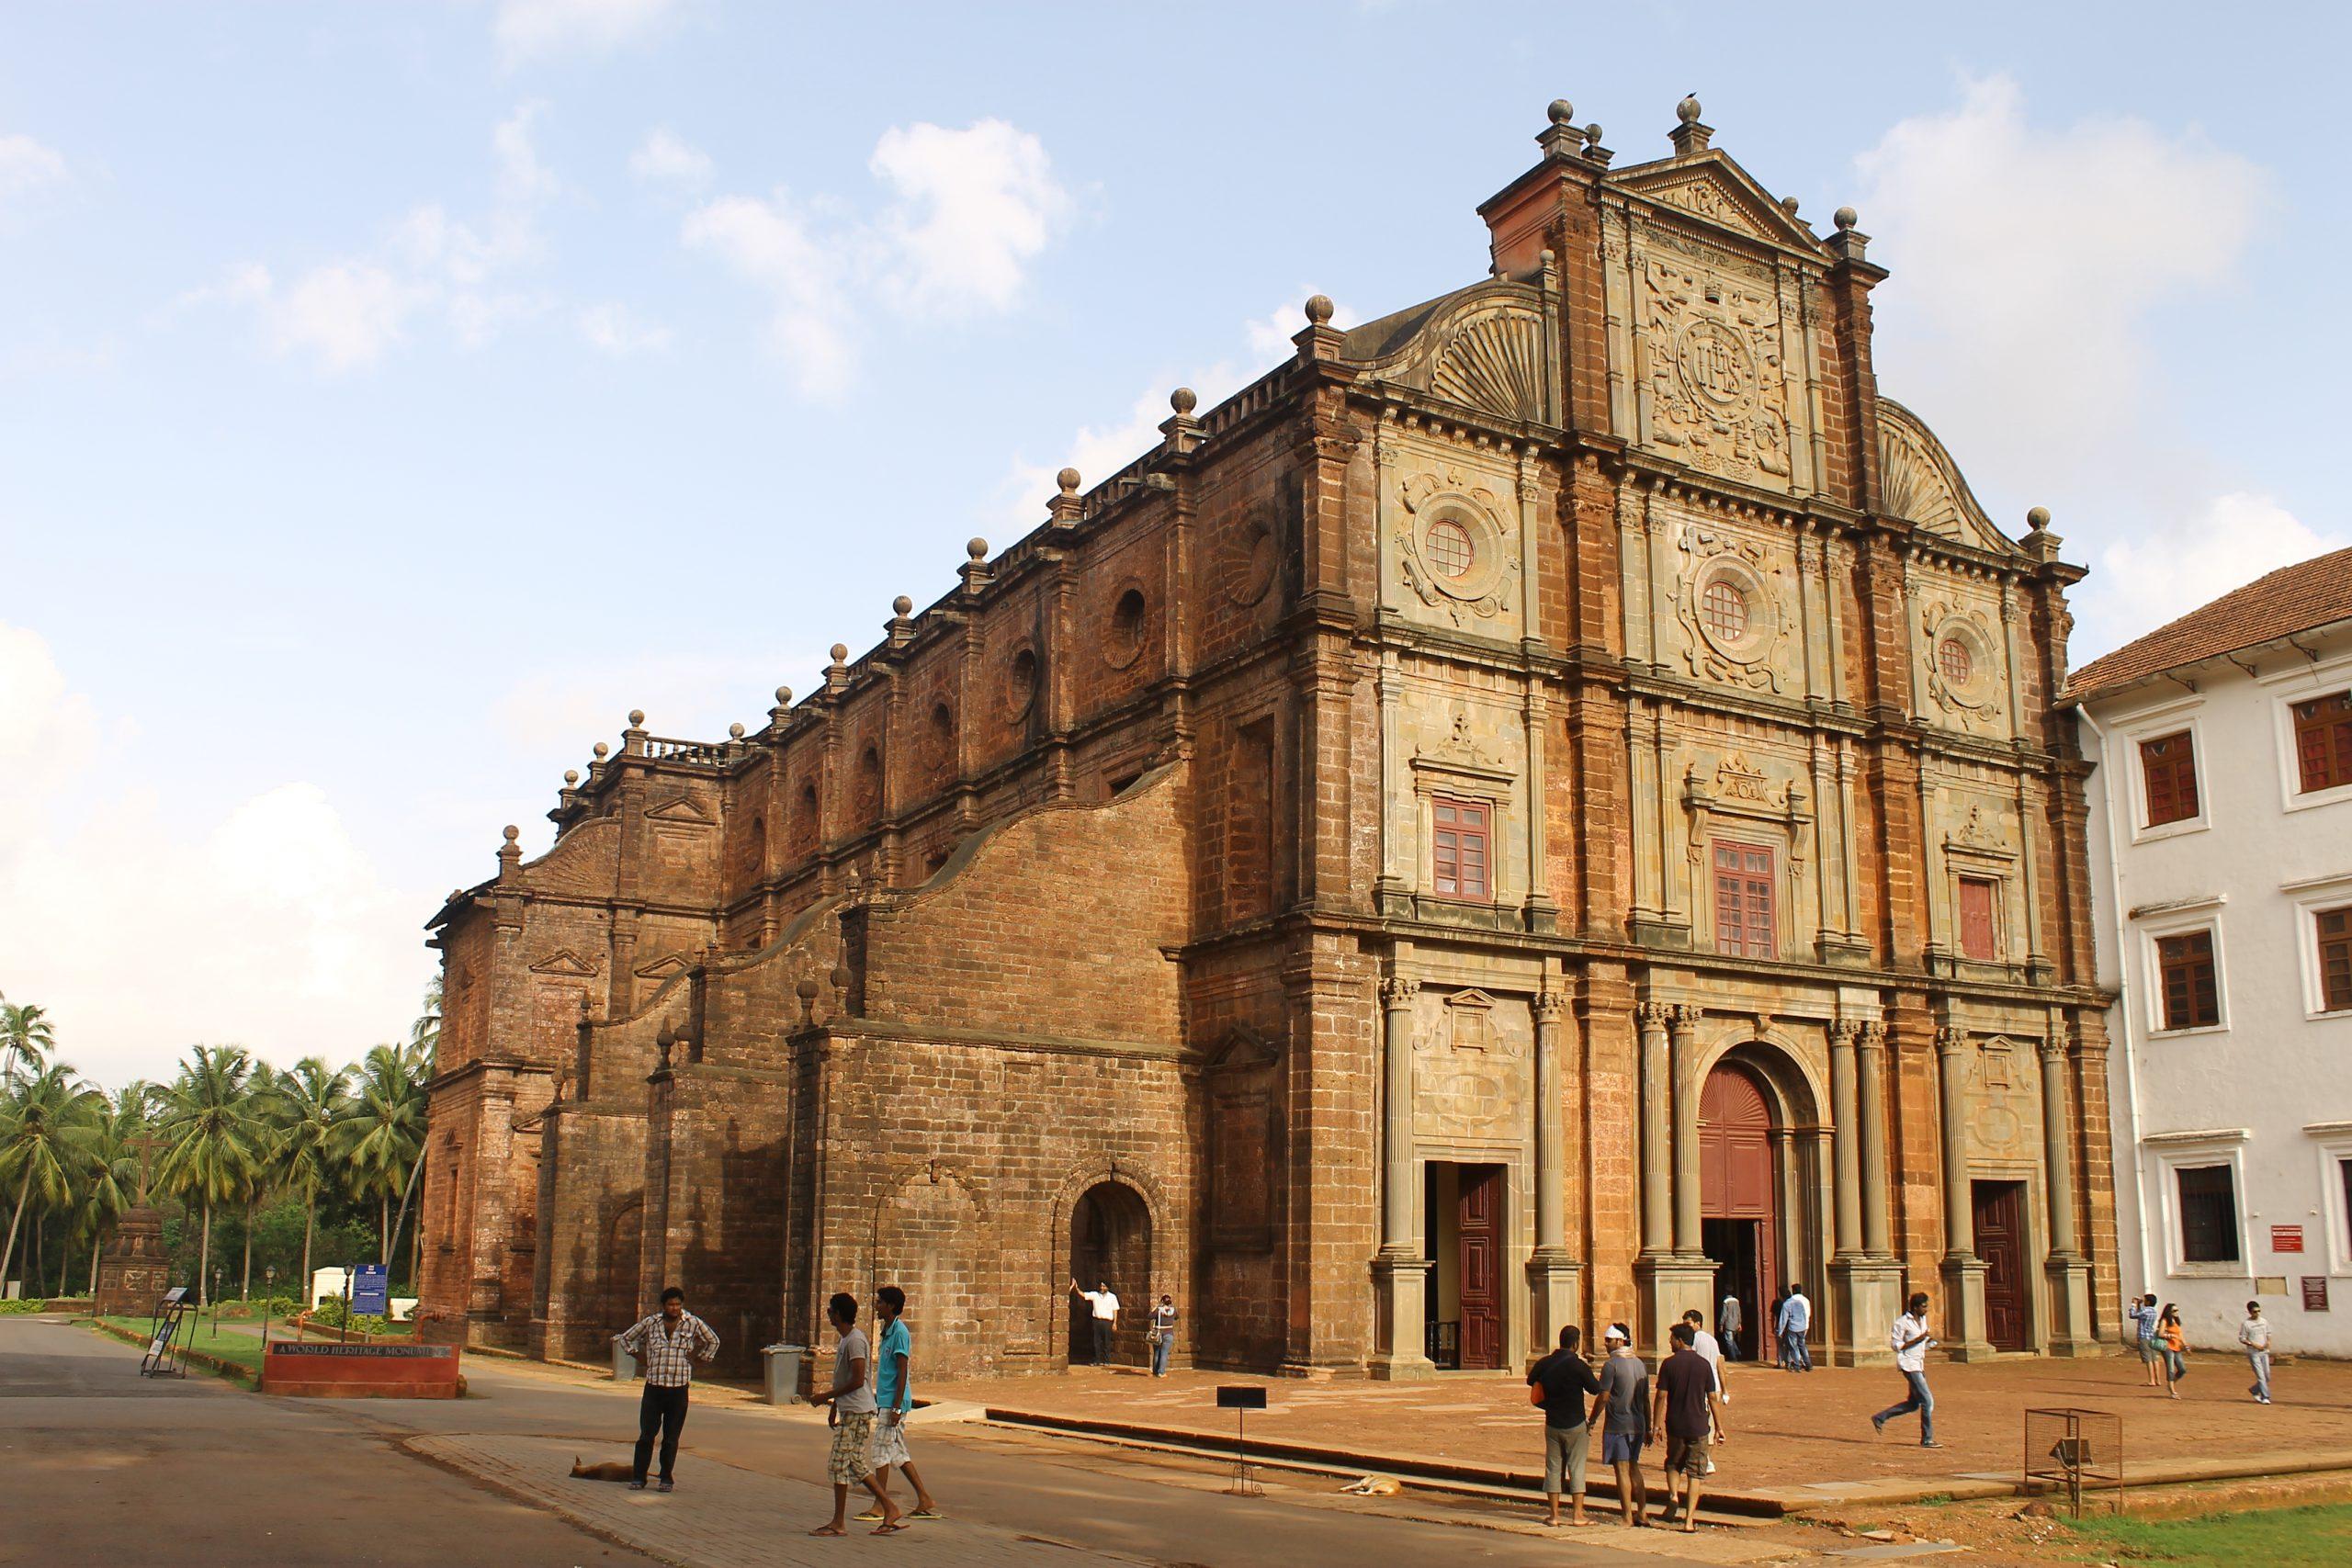 Popular Churches That You Must Visit in Goa - Bom Jesus Basilica